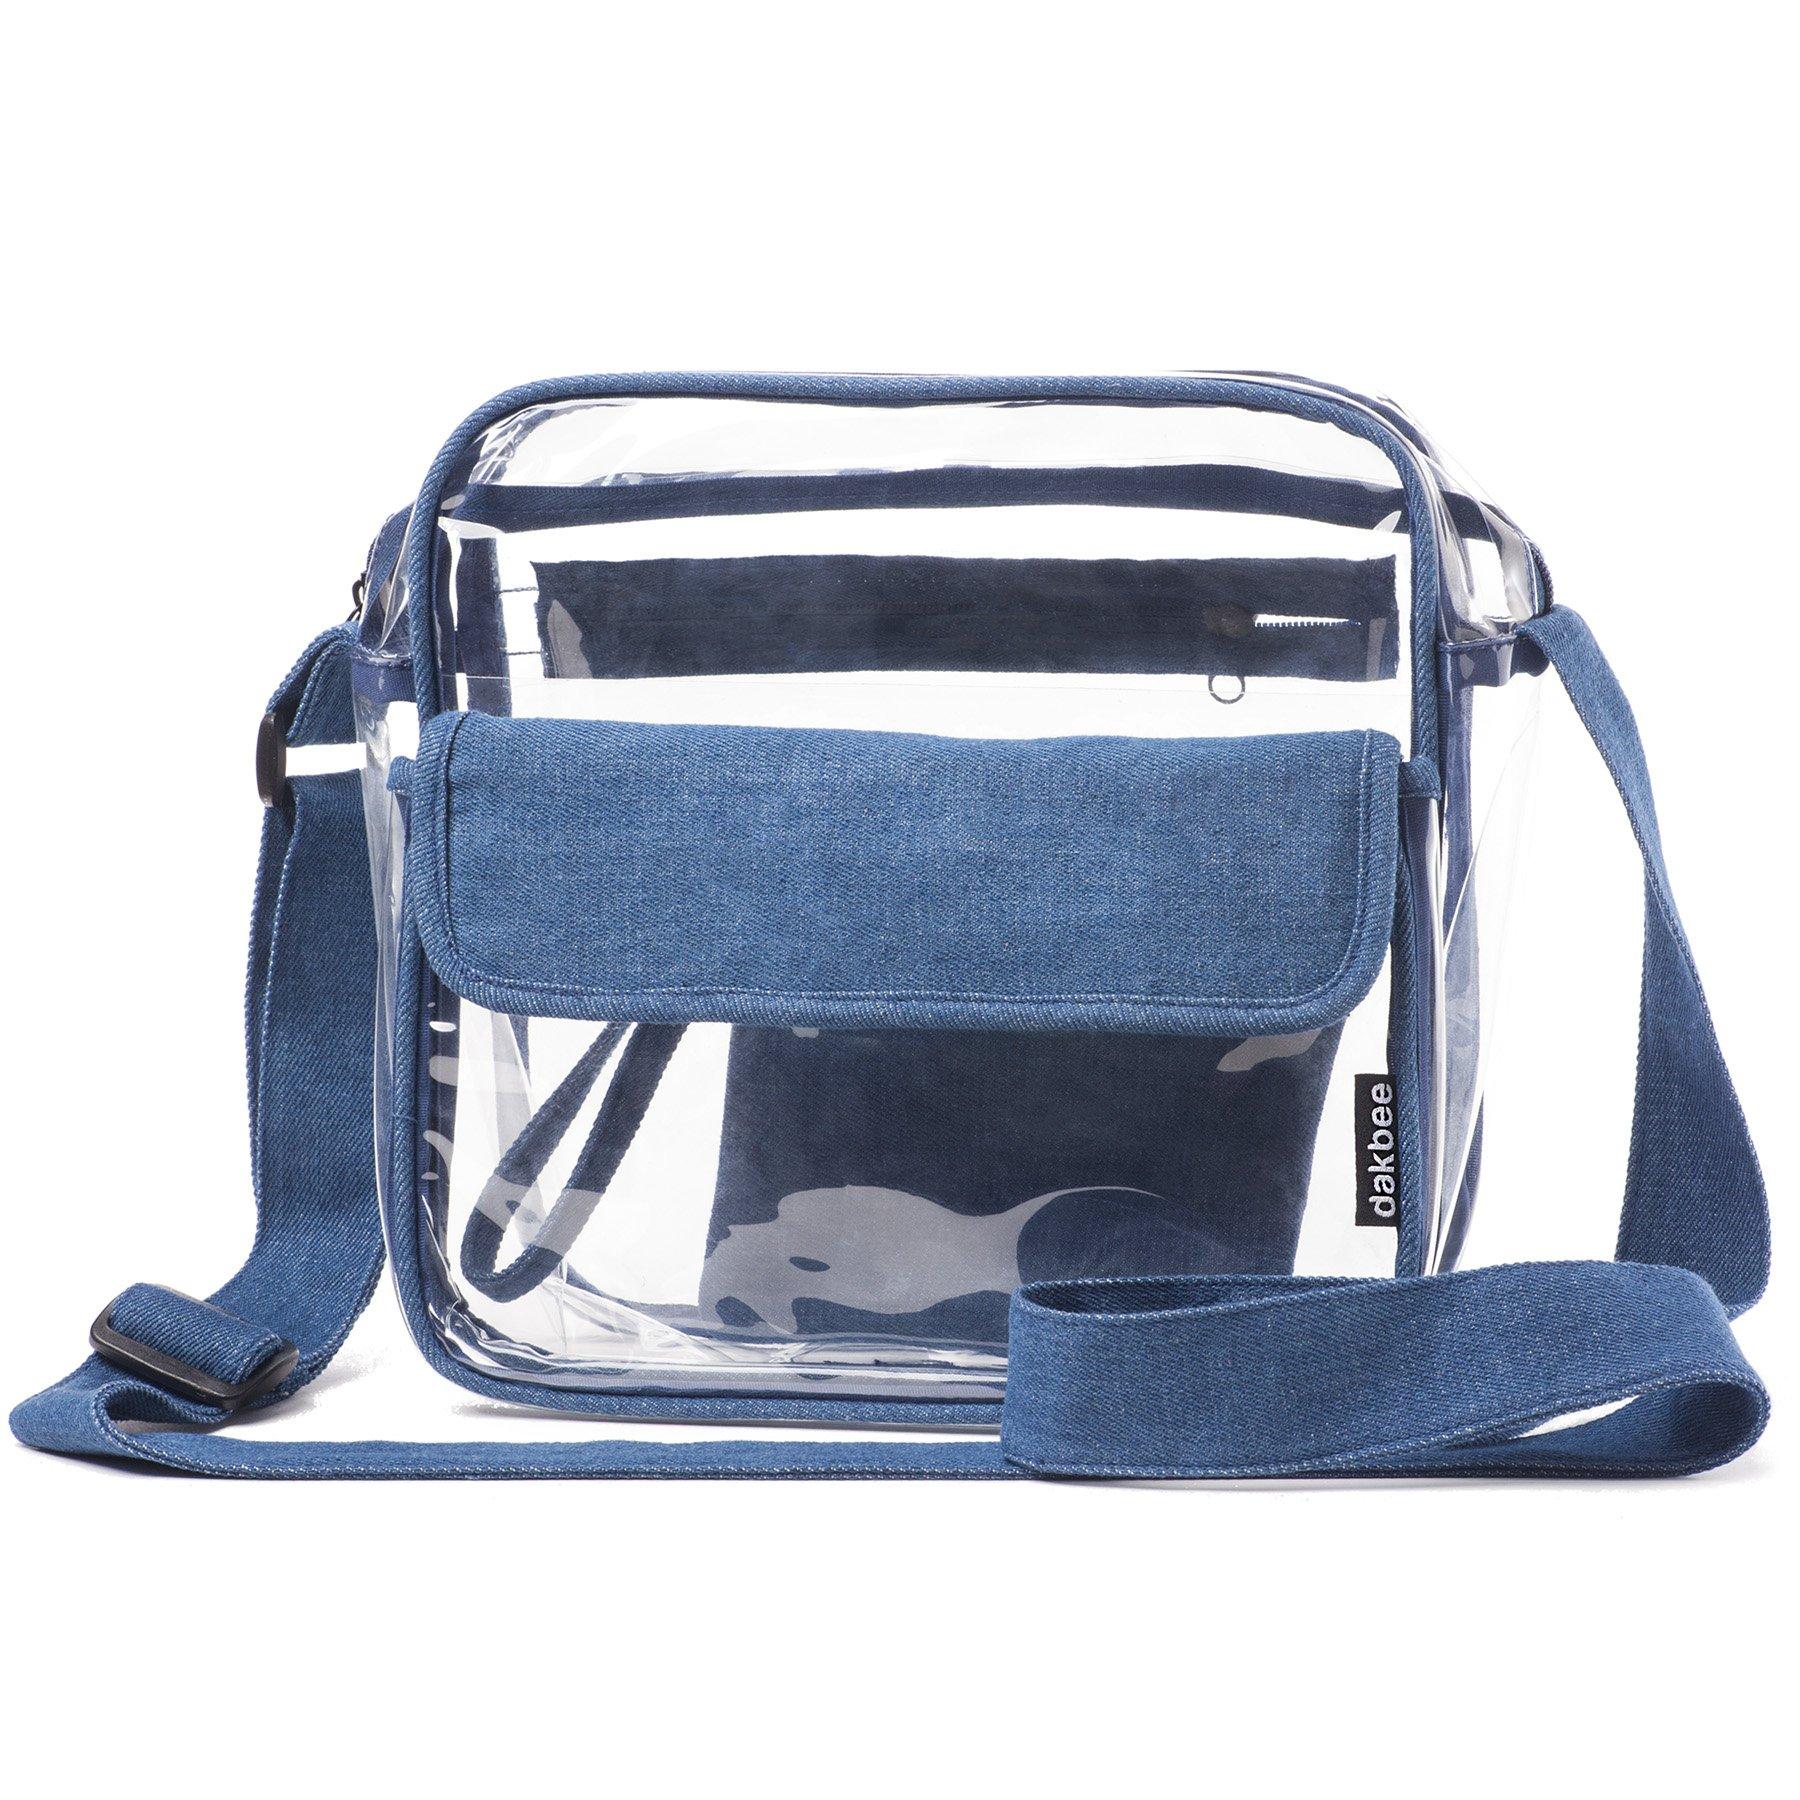 Clear Stadium Bag with Denim Trim | NFL NCAA PGA NASCAR Approved 10 x 10 x 5 Crossbody Messenger with Adjustable Shoulder Strap | 2018 Dakbee Original with Zippered Pockets| Bonus Denim Privacy Clutch